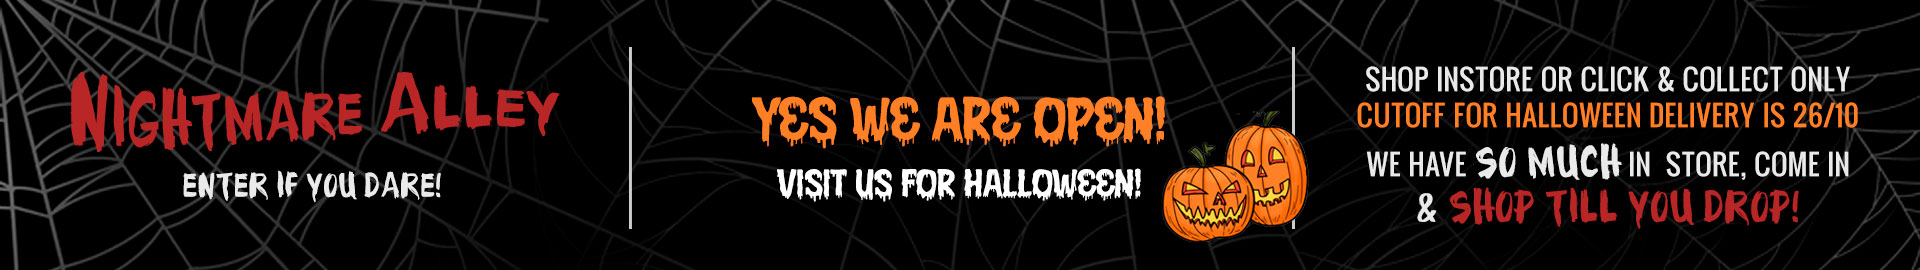 Halloween on the Mornington Peninsula Little Shop of Horrors Costumery